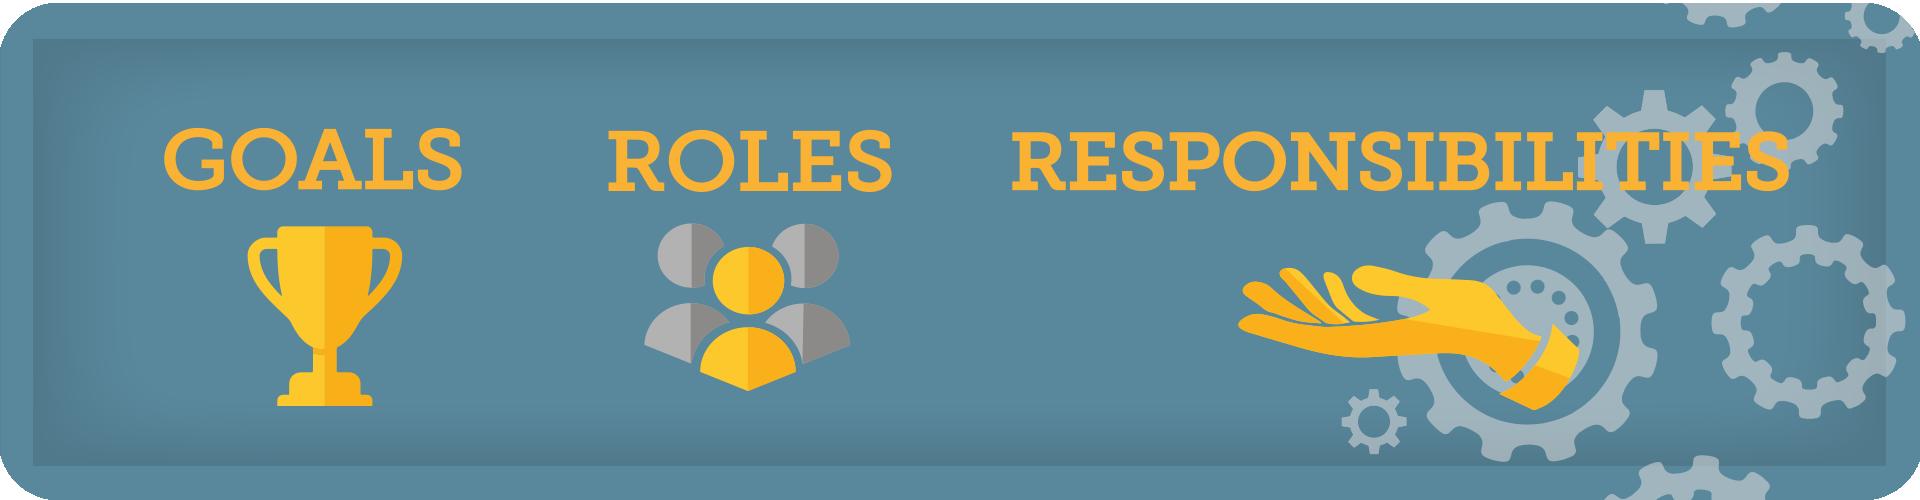 goals roles and responsibilities banner